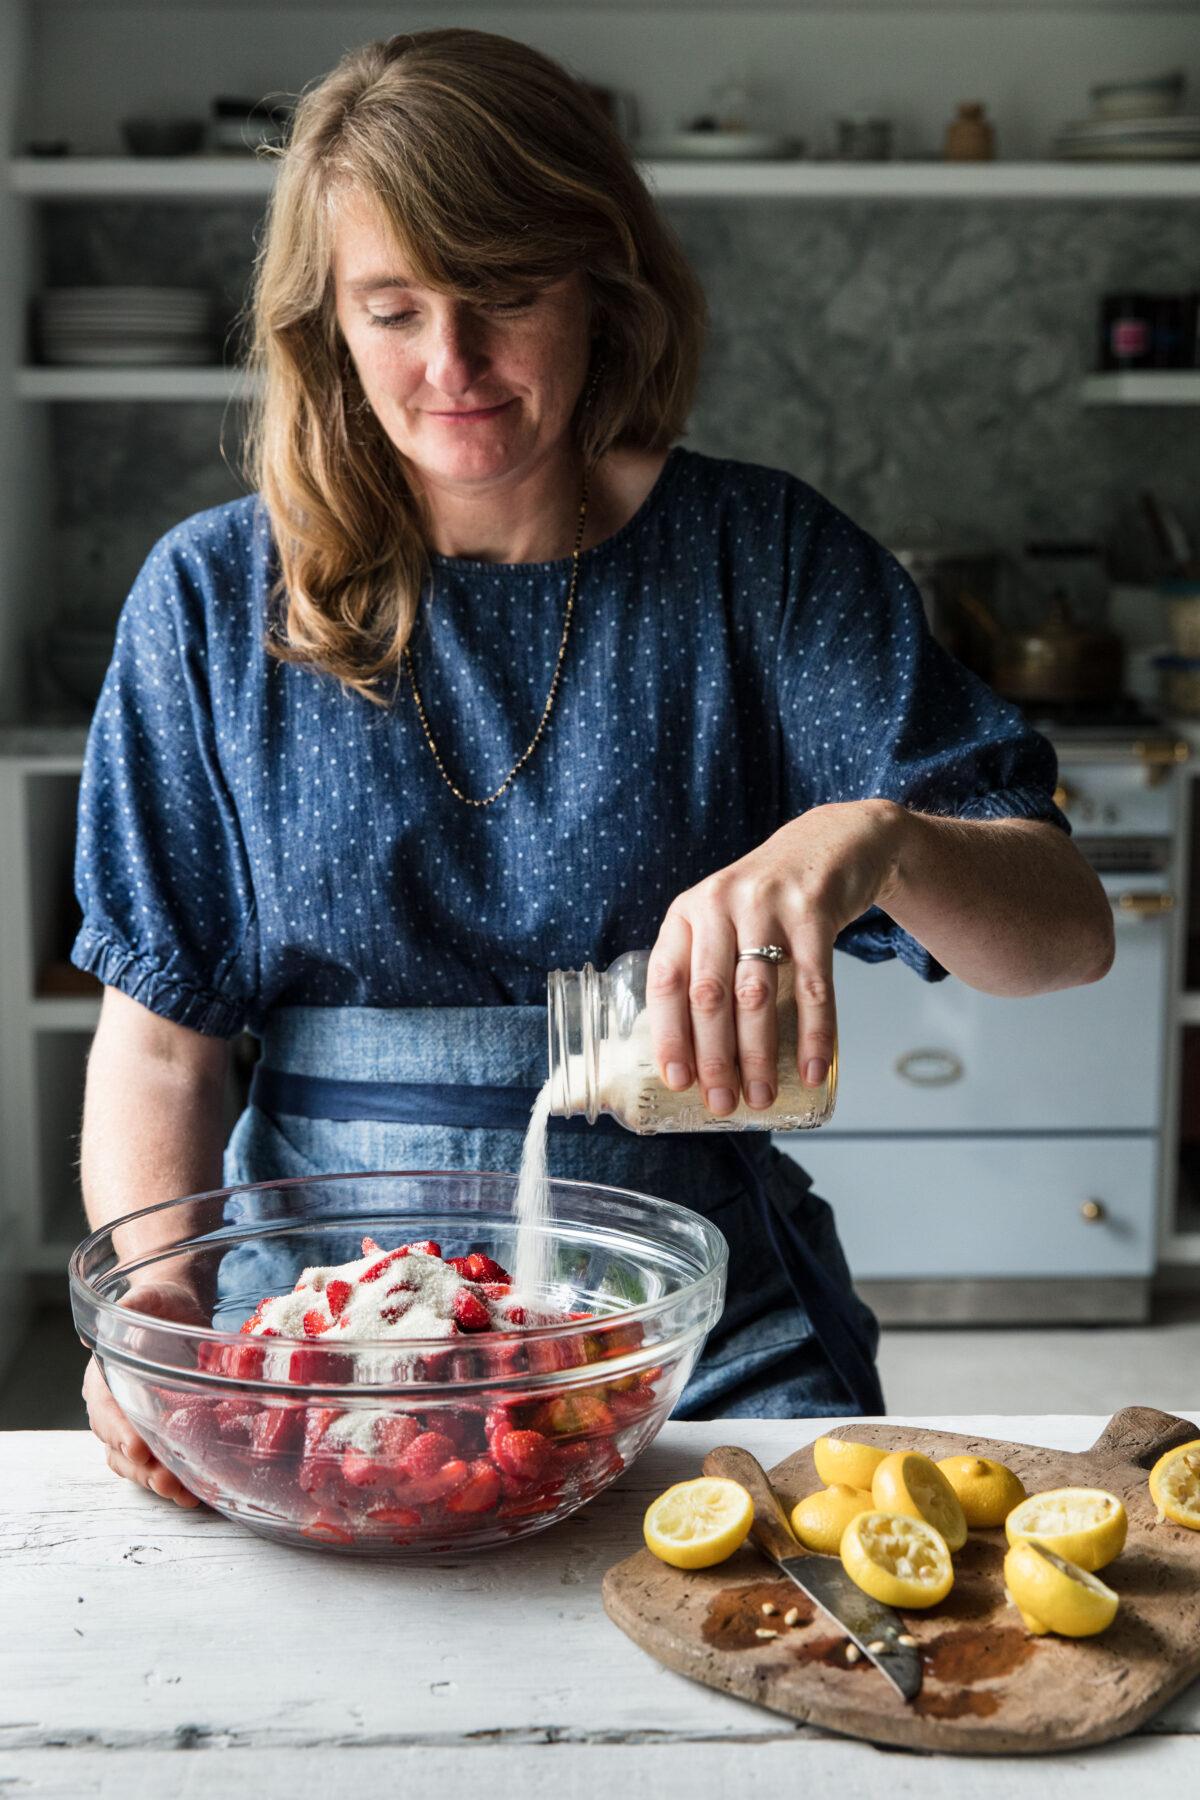 Woman mixes strawberries with sugar and lemon juice to make jam